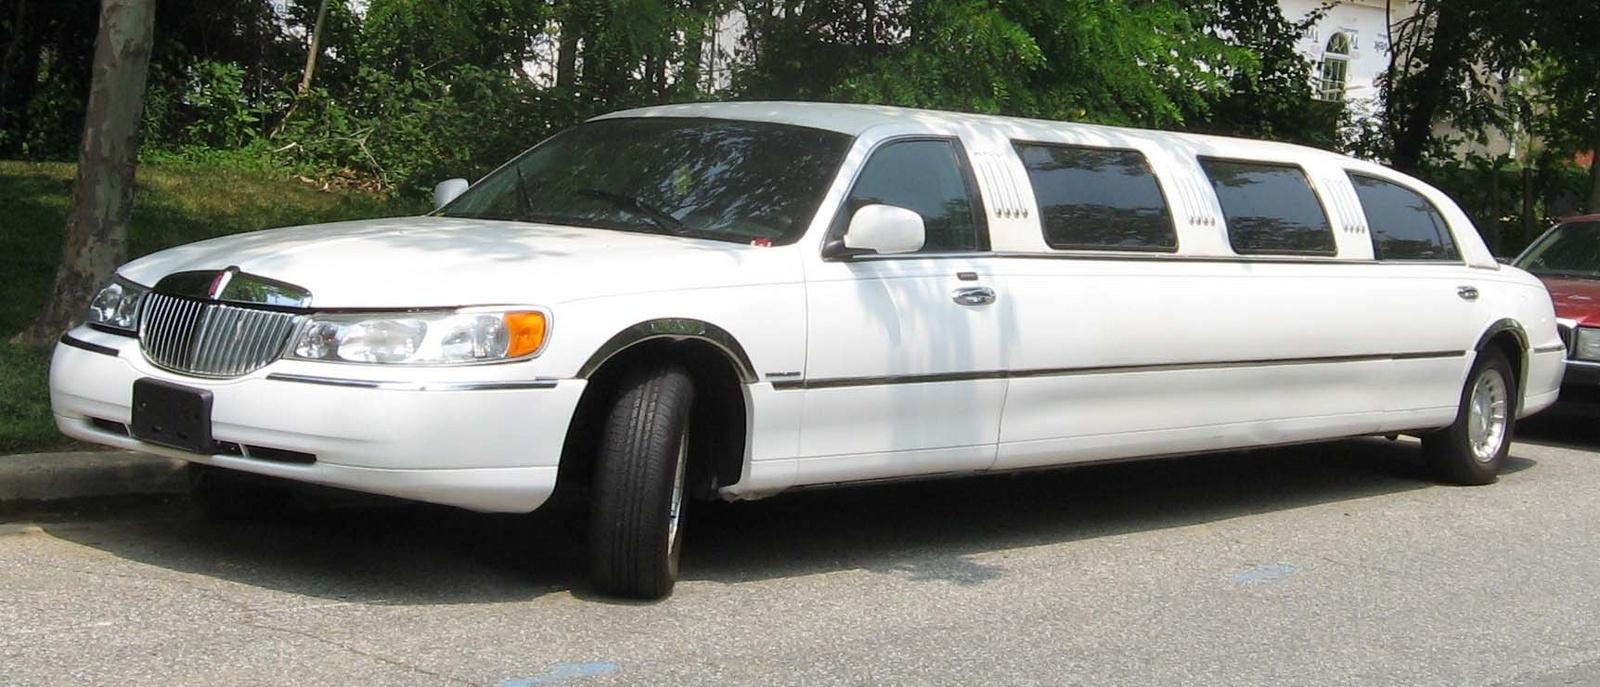 General Questions Which Car Has The Most Rear Leg Room Cargurus Lincoln Town Sleep Mark Helpful